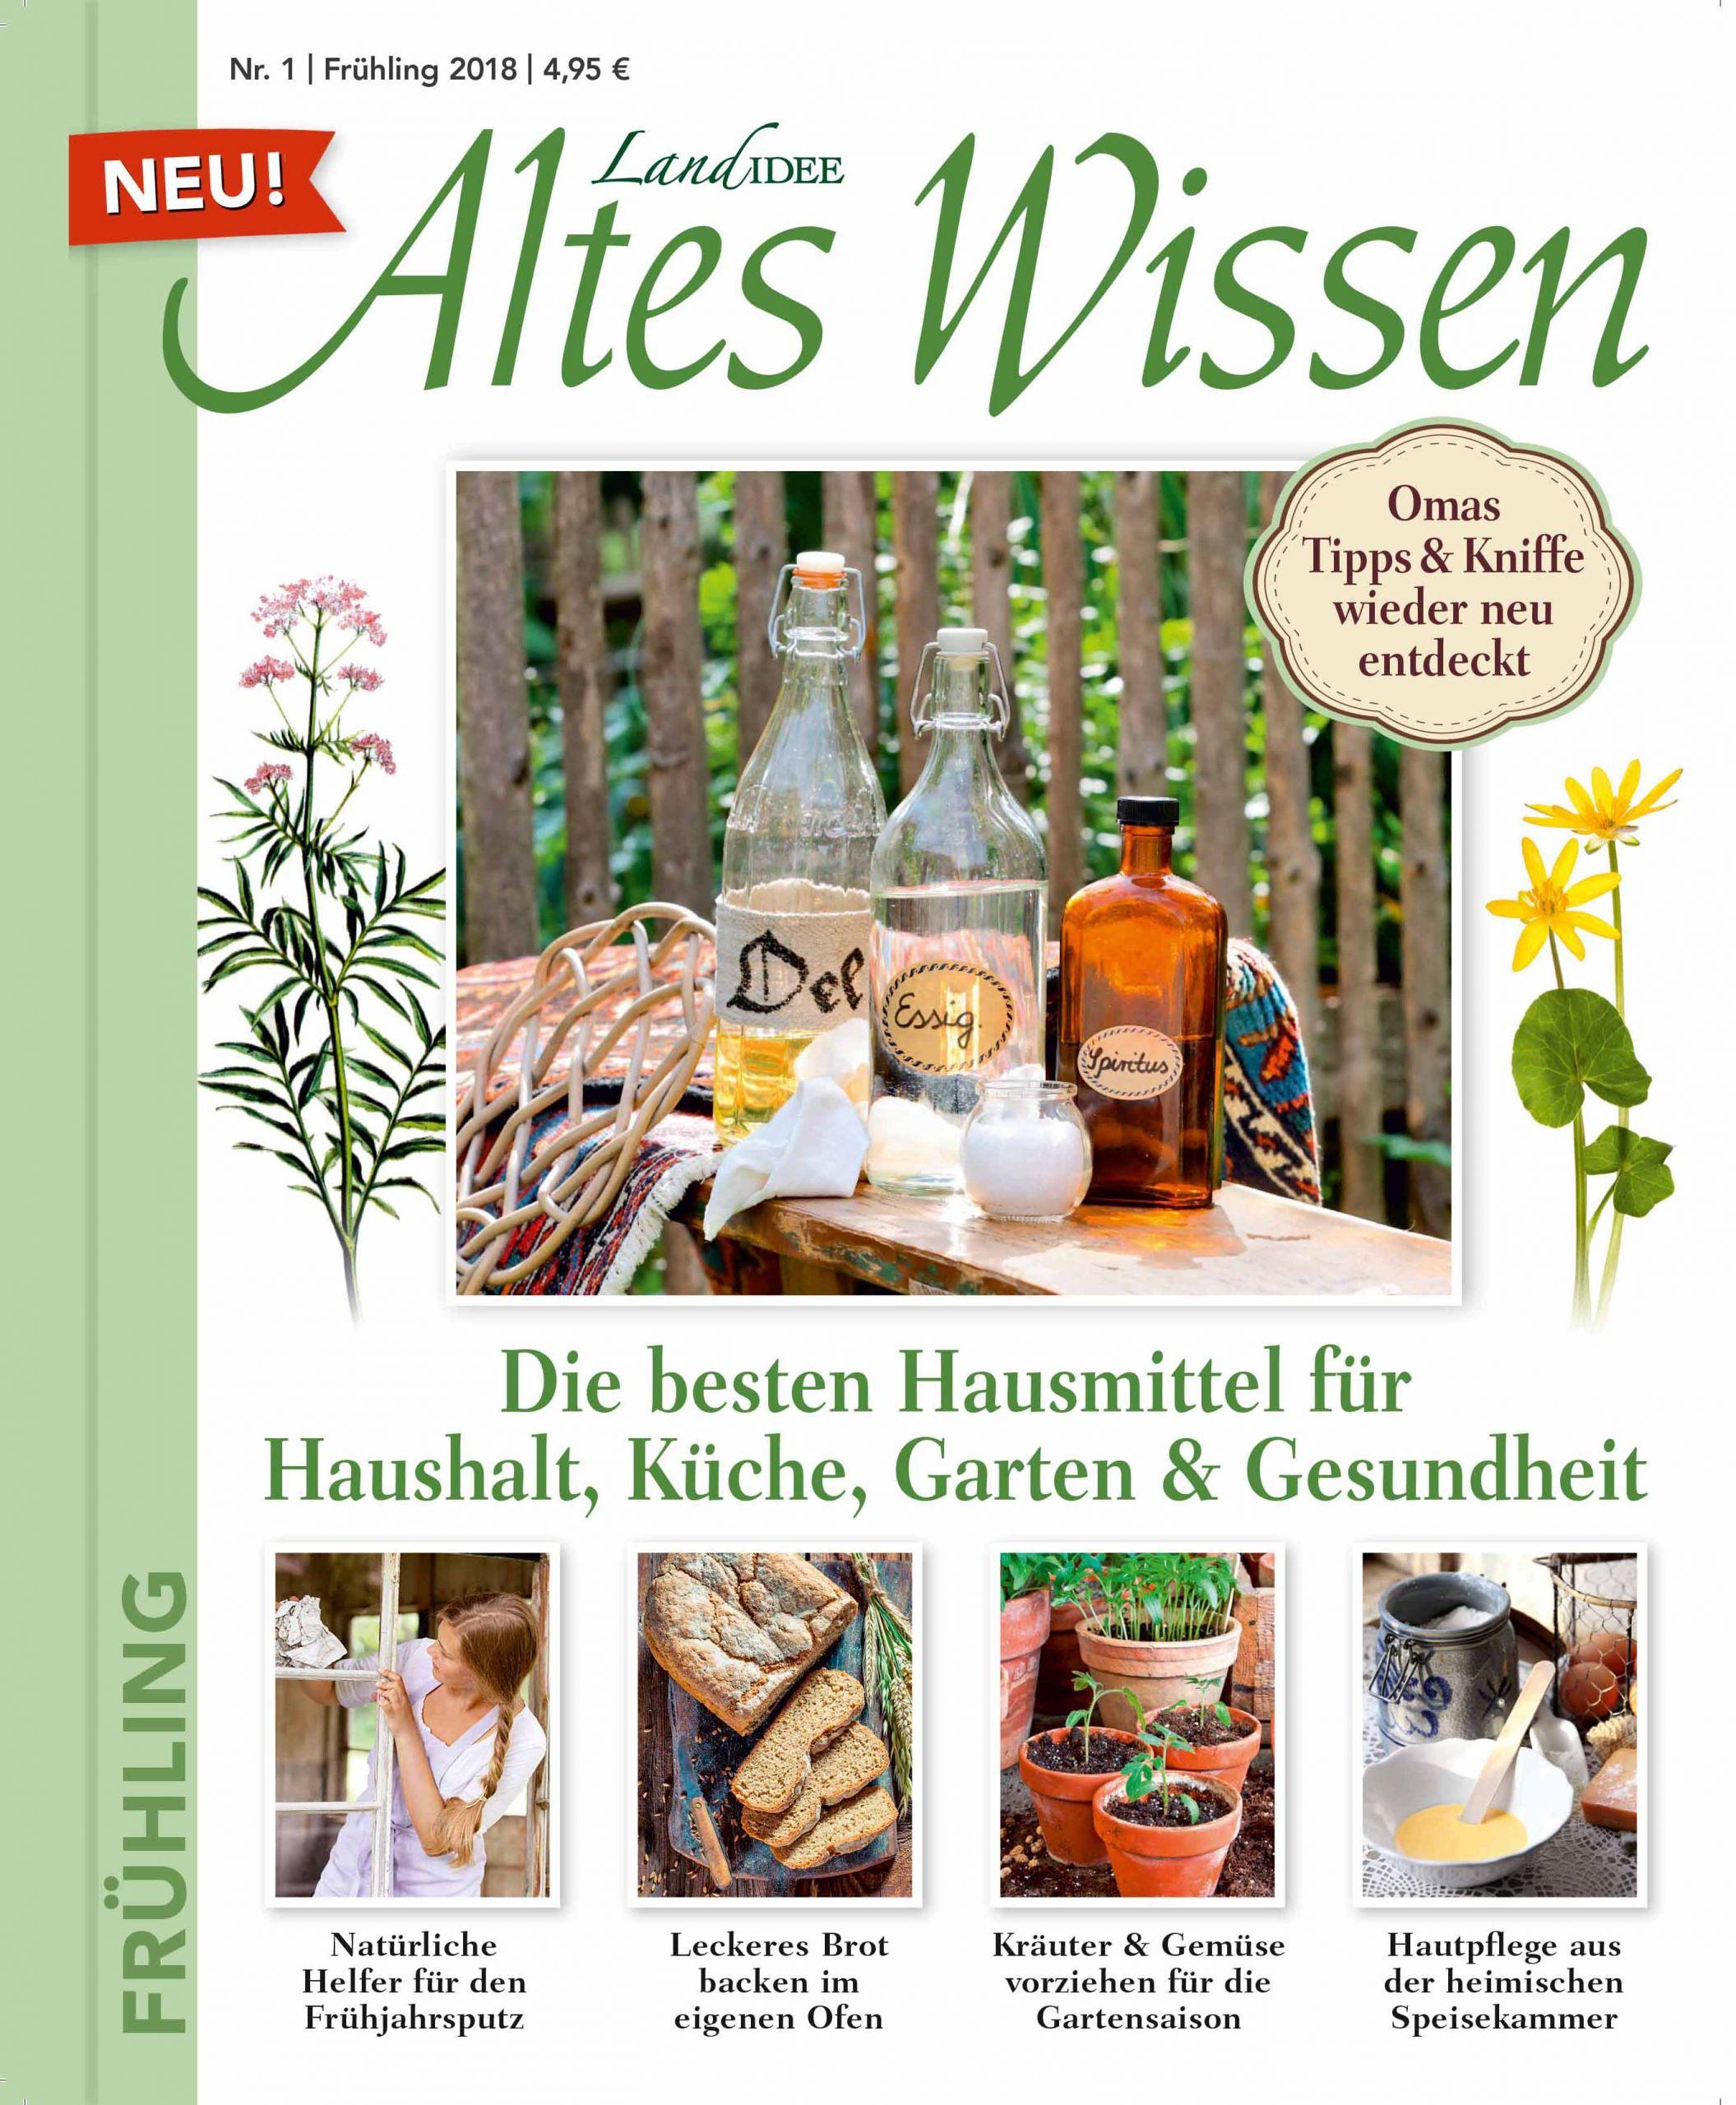 Cover LandIDEE Altes Wissen